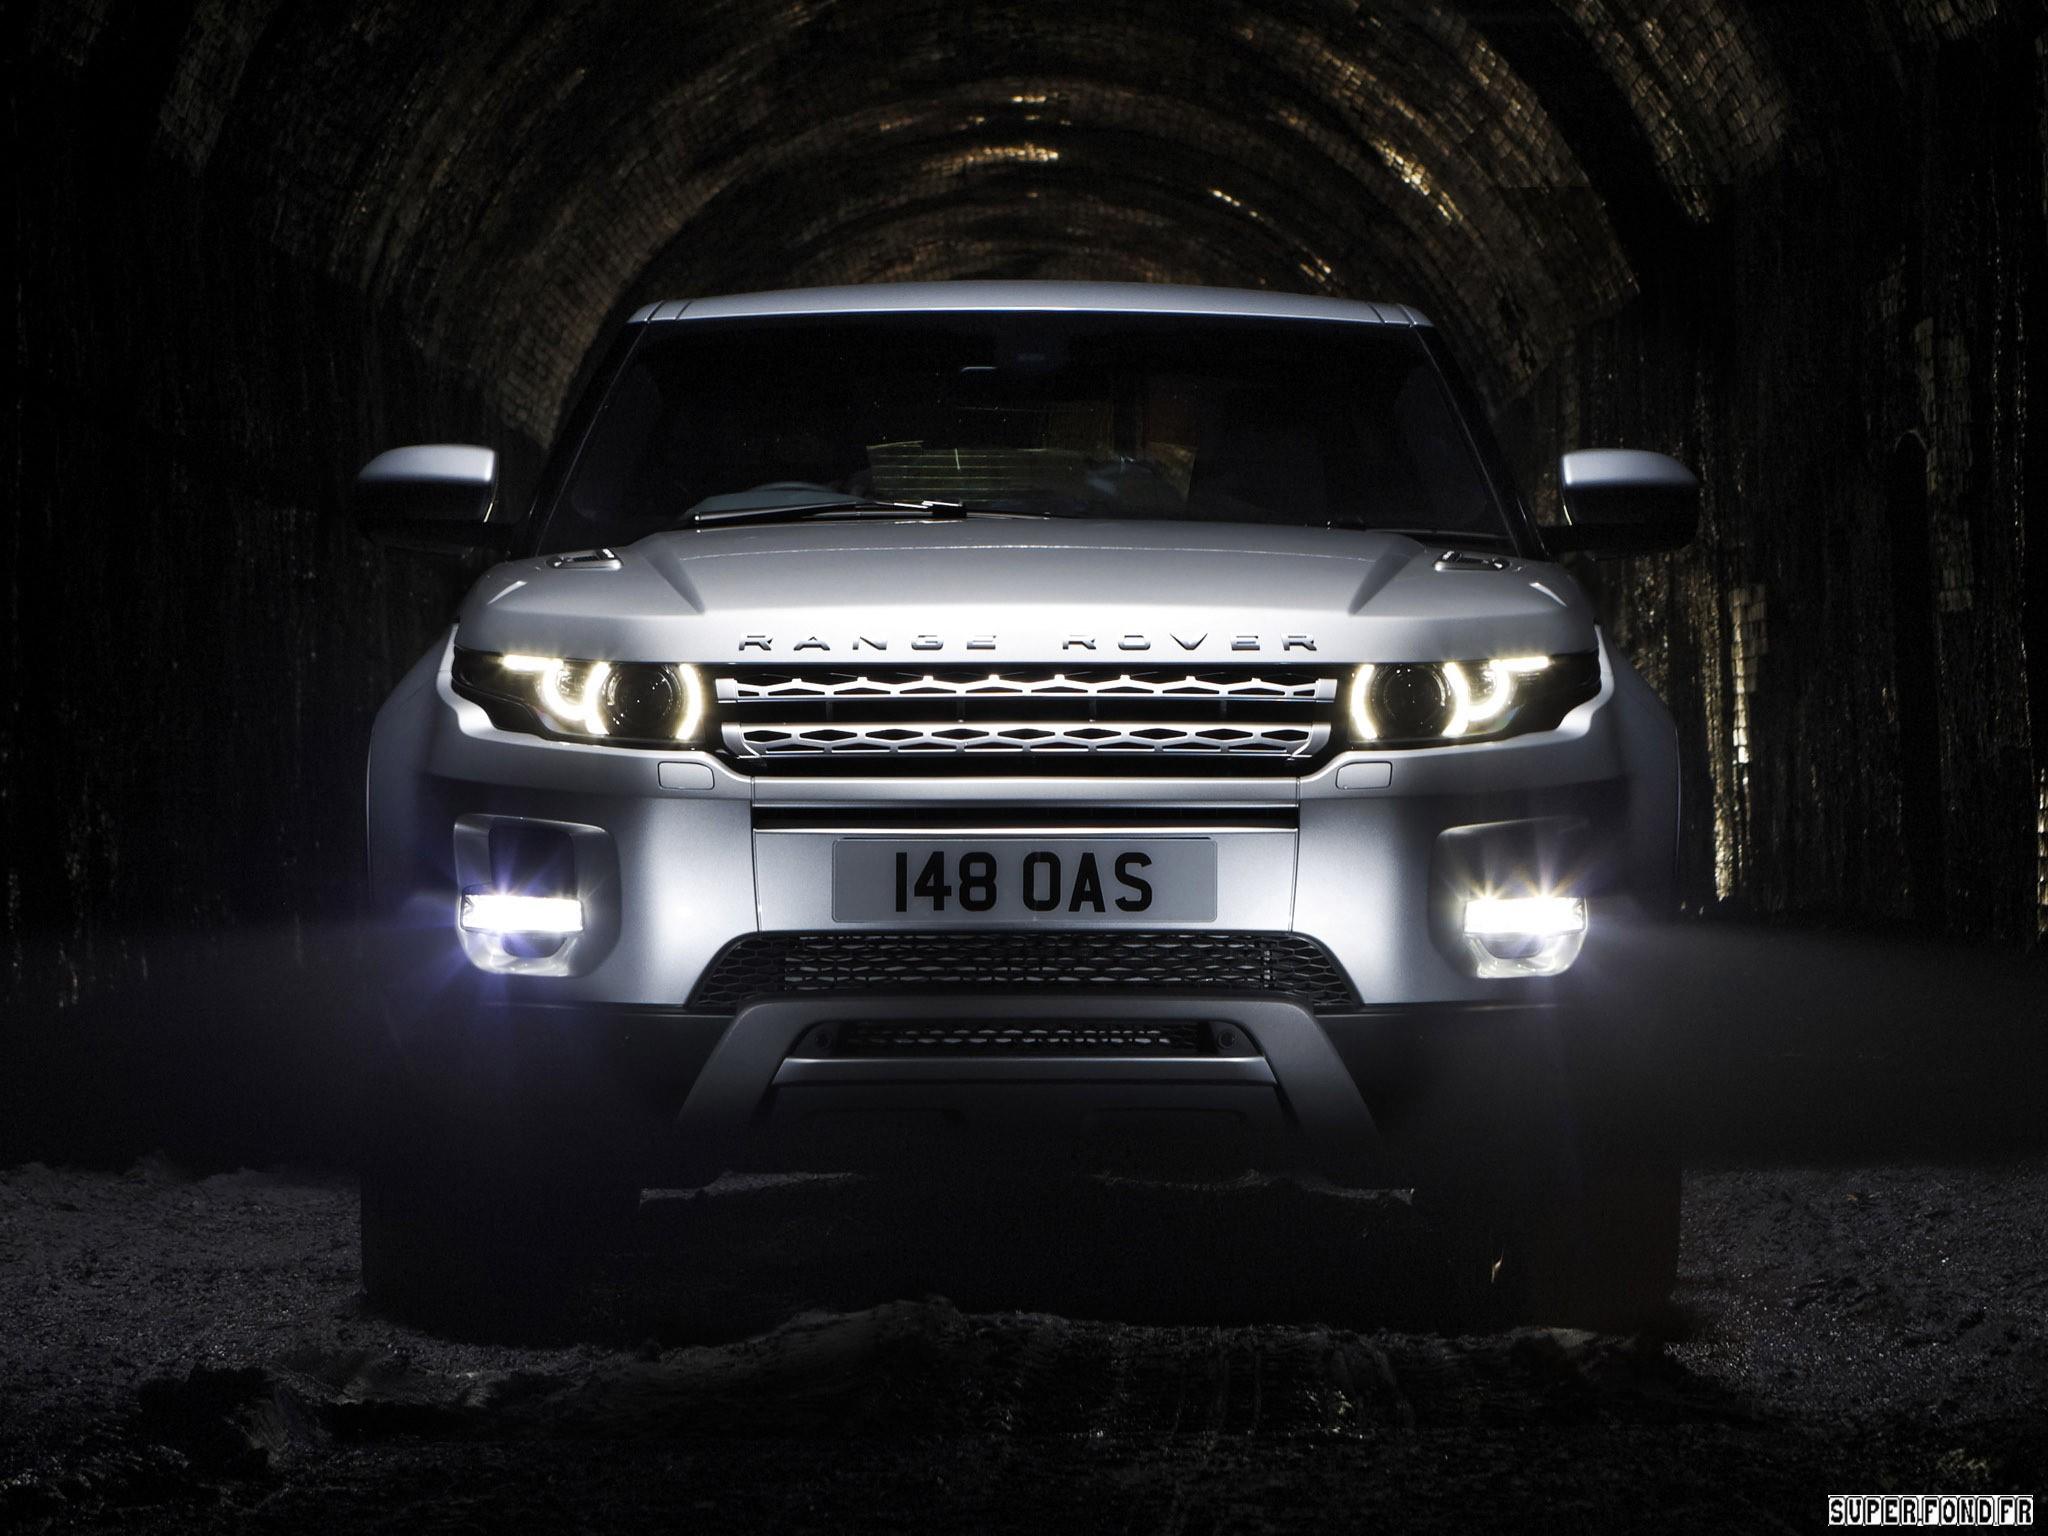 2011 Land Rover Range Rover Evoque Coupe SI4 Prestige UK